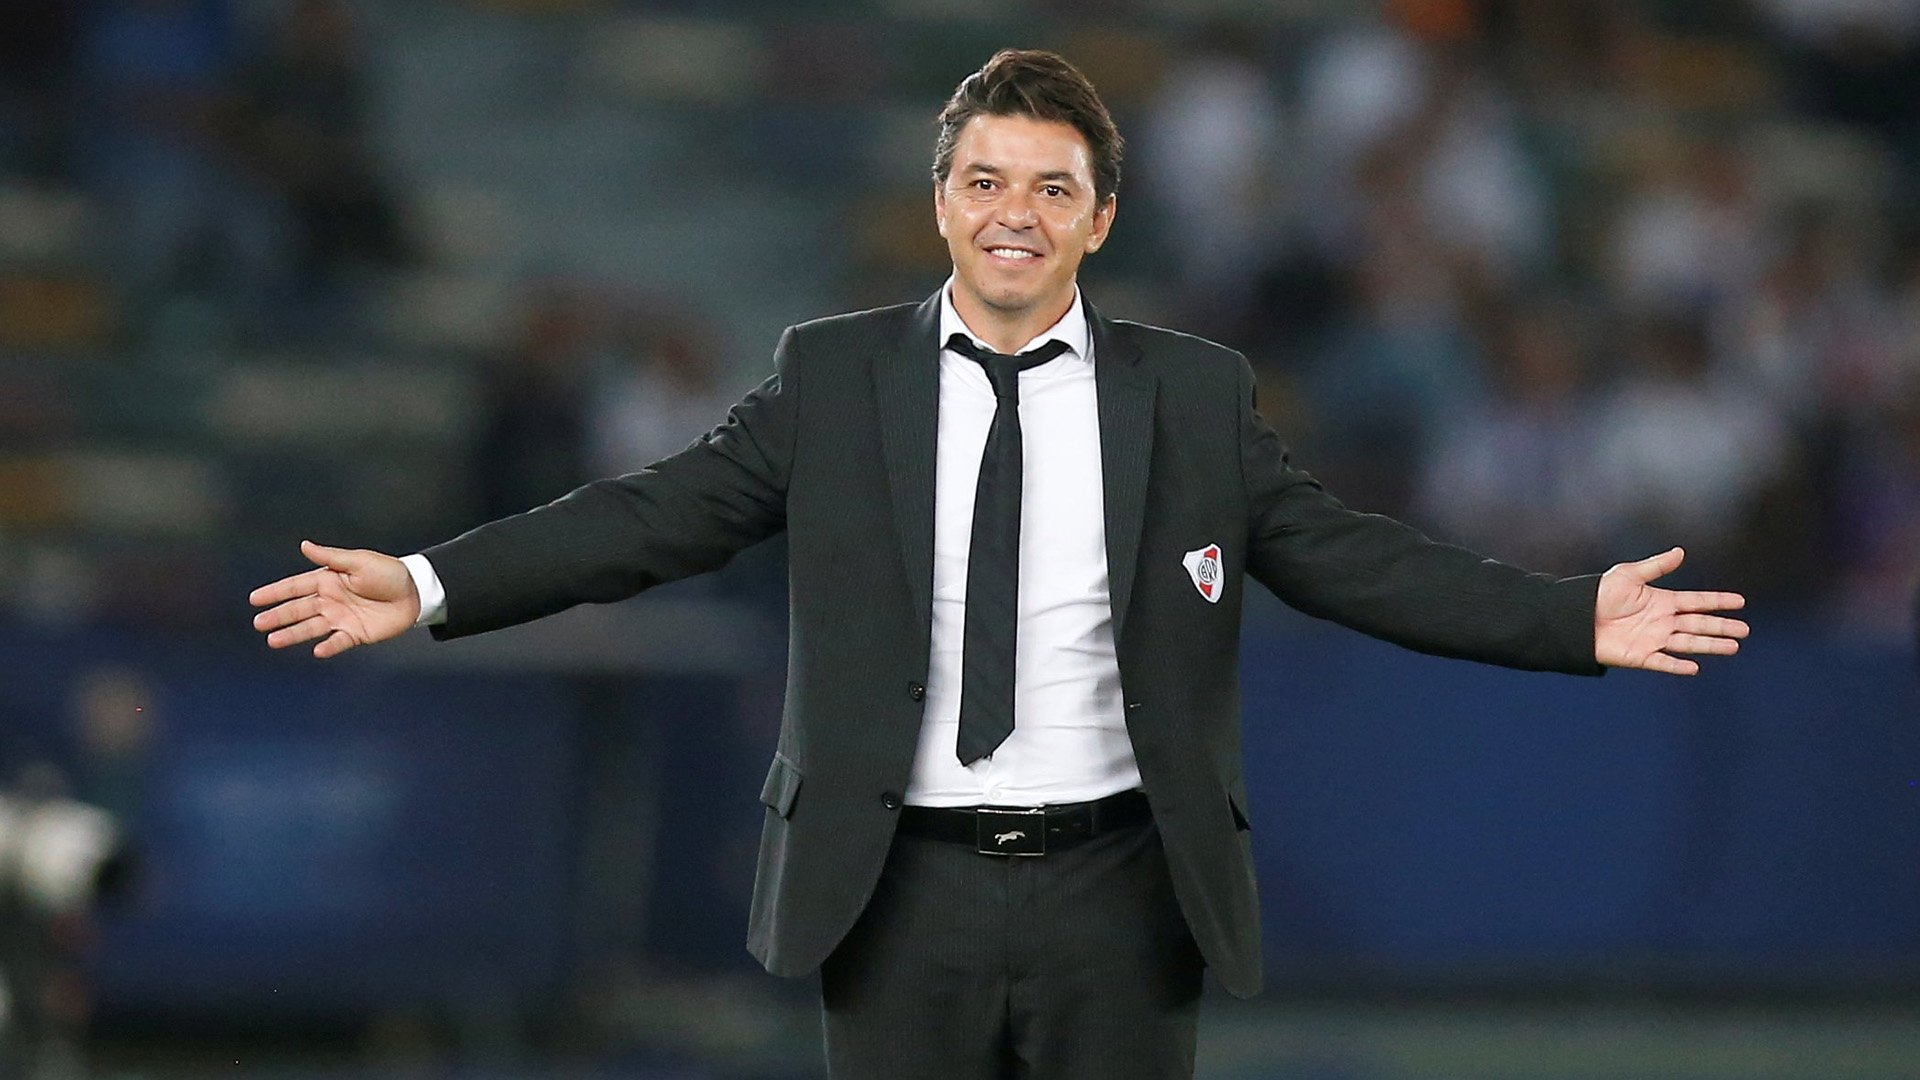 Marcelo GALLARDO talks about coaching the Argentina national team   Mundo  Albiceleste